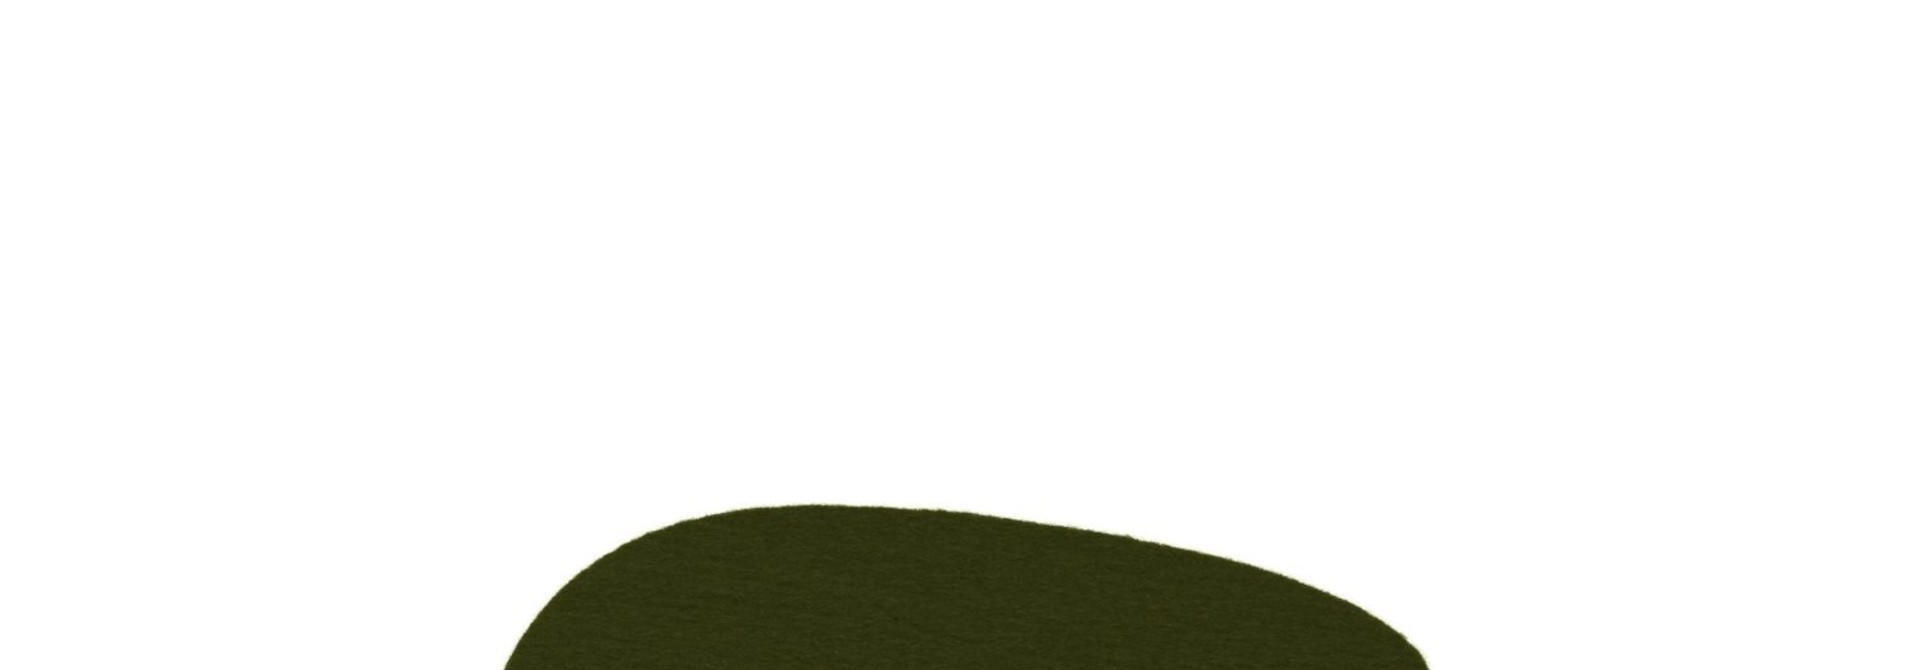 Felt Trivet Stone Small - Moss